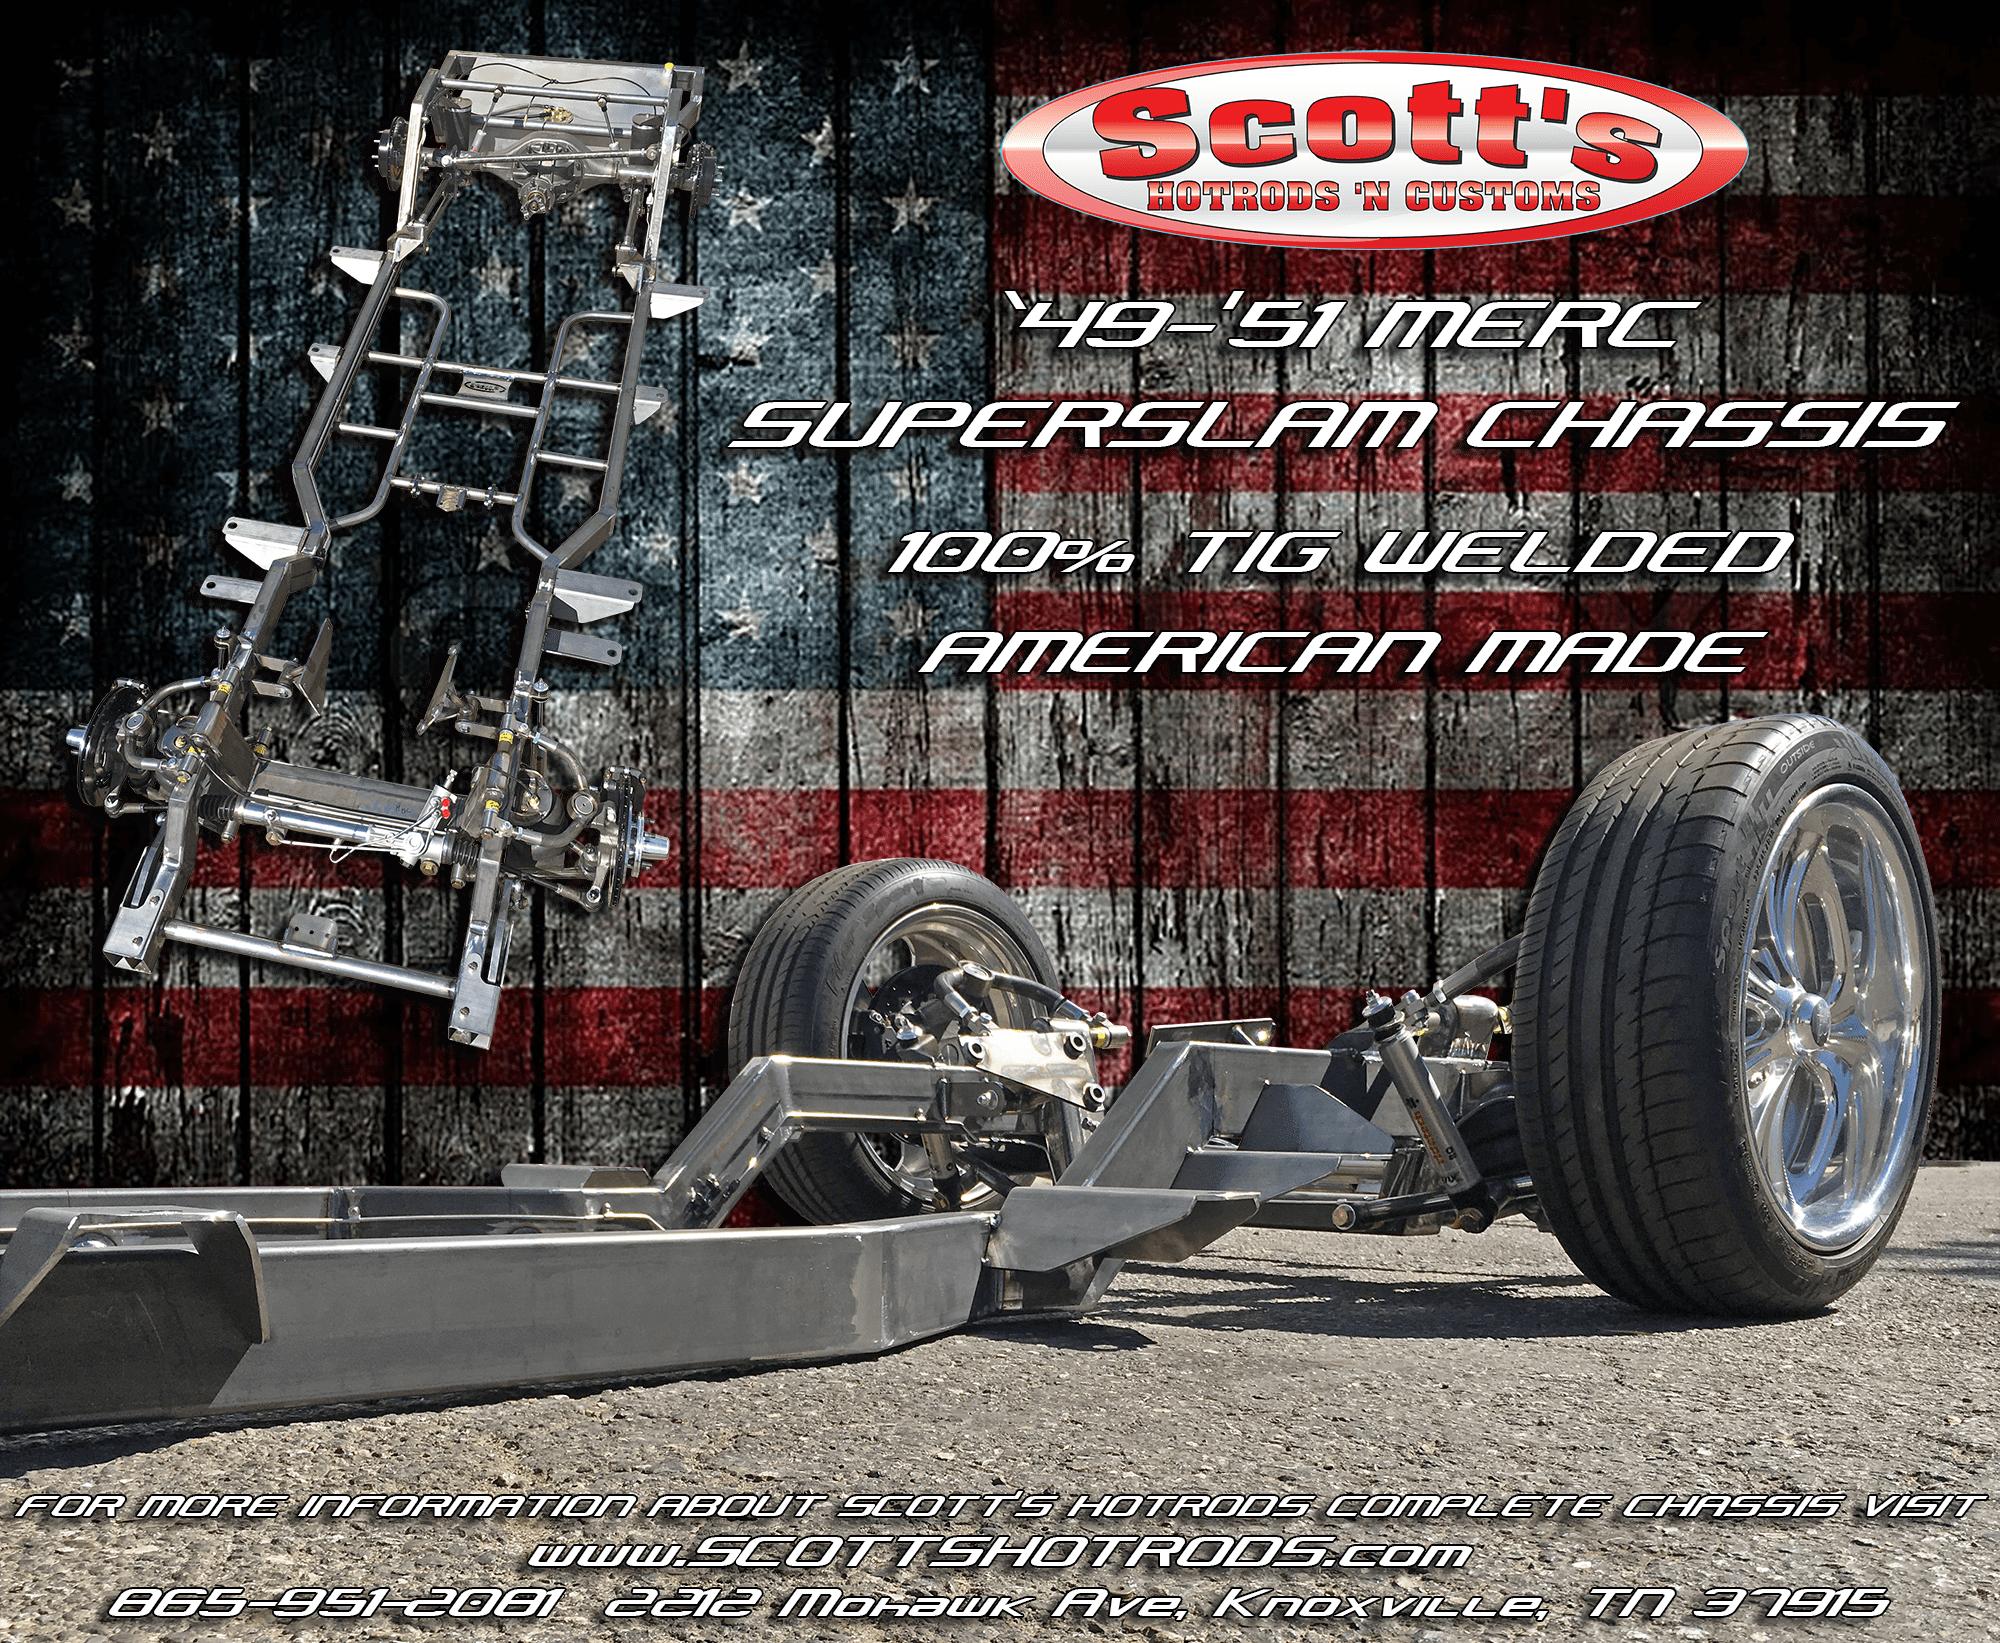 Scotts-1949-1951-Mercury-Chassis-American-made